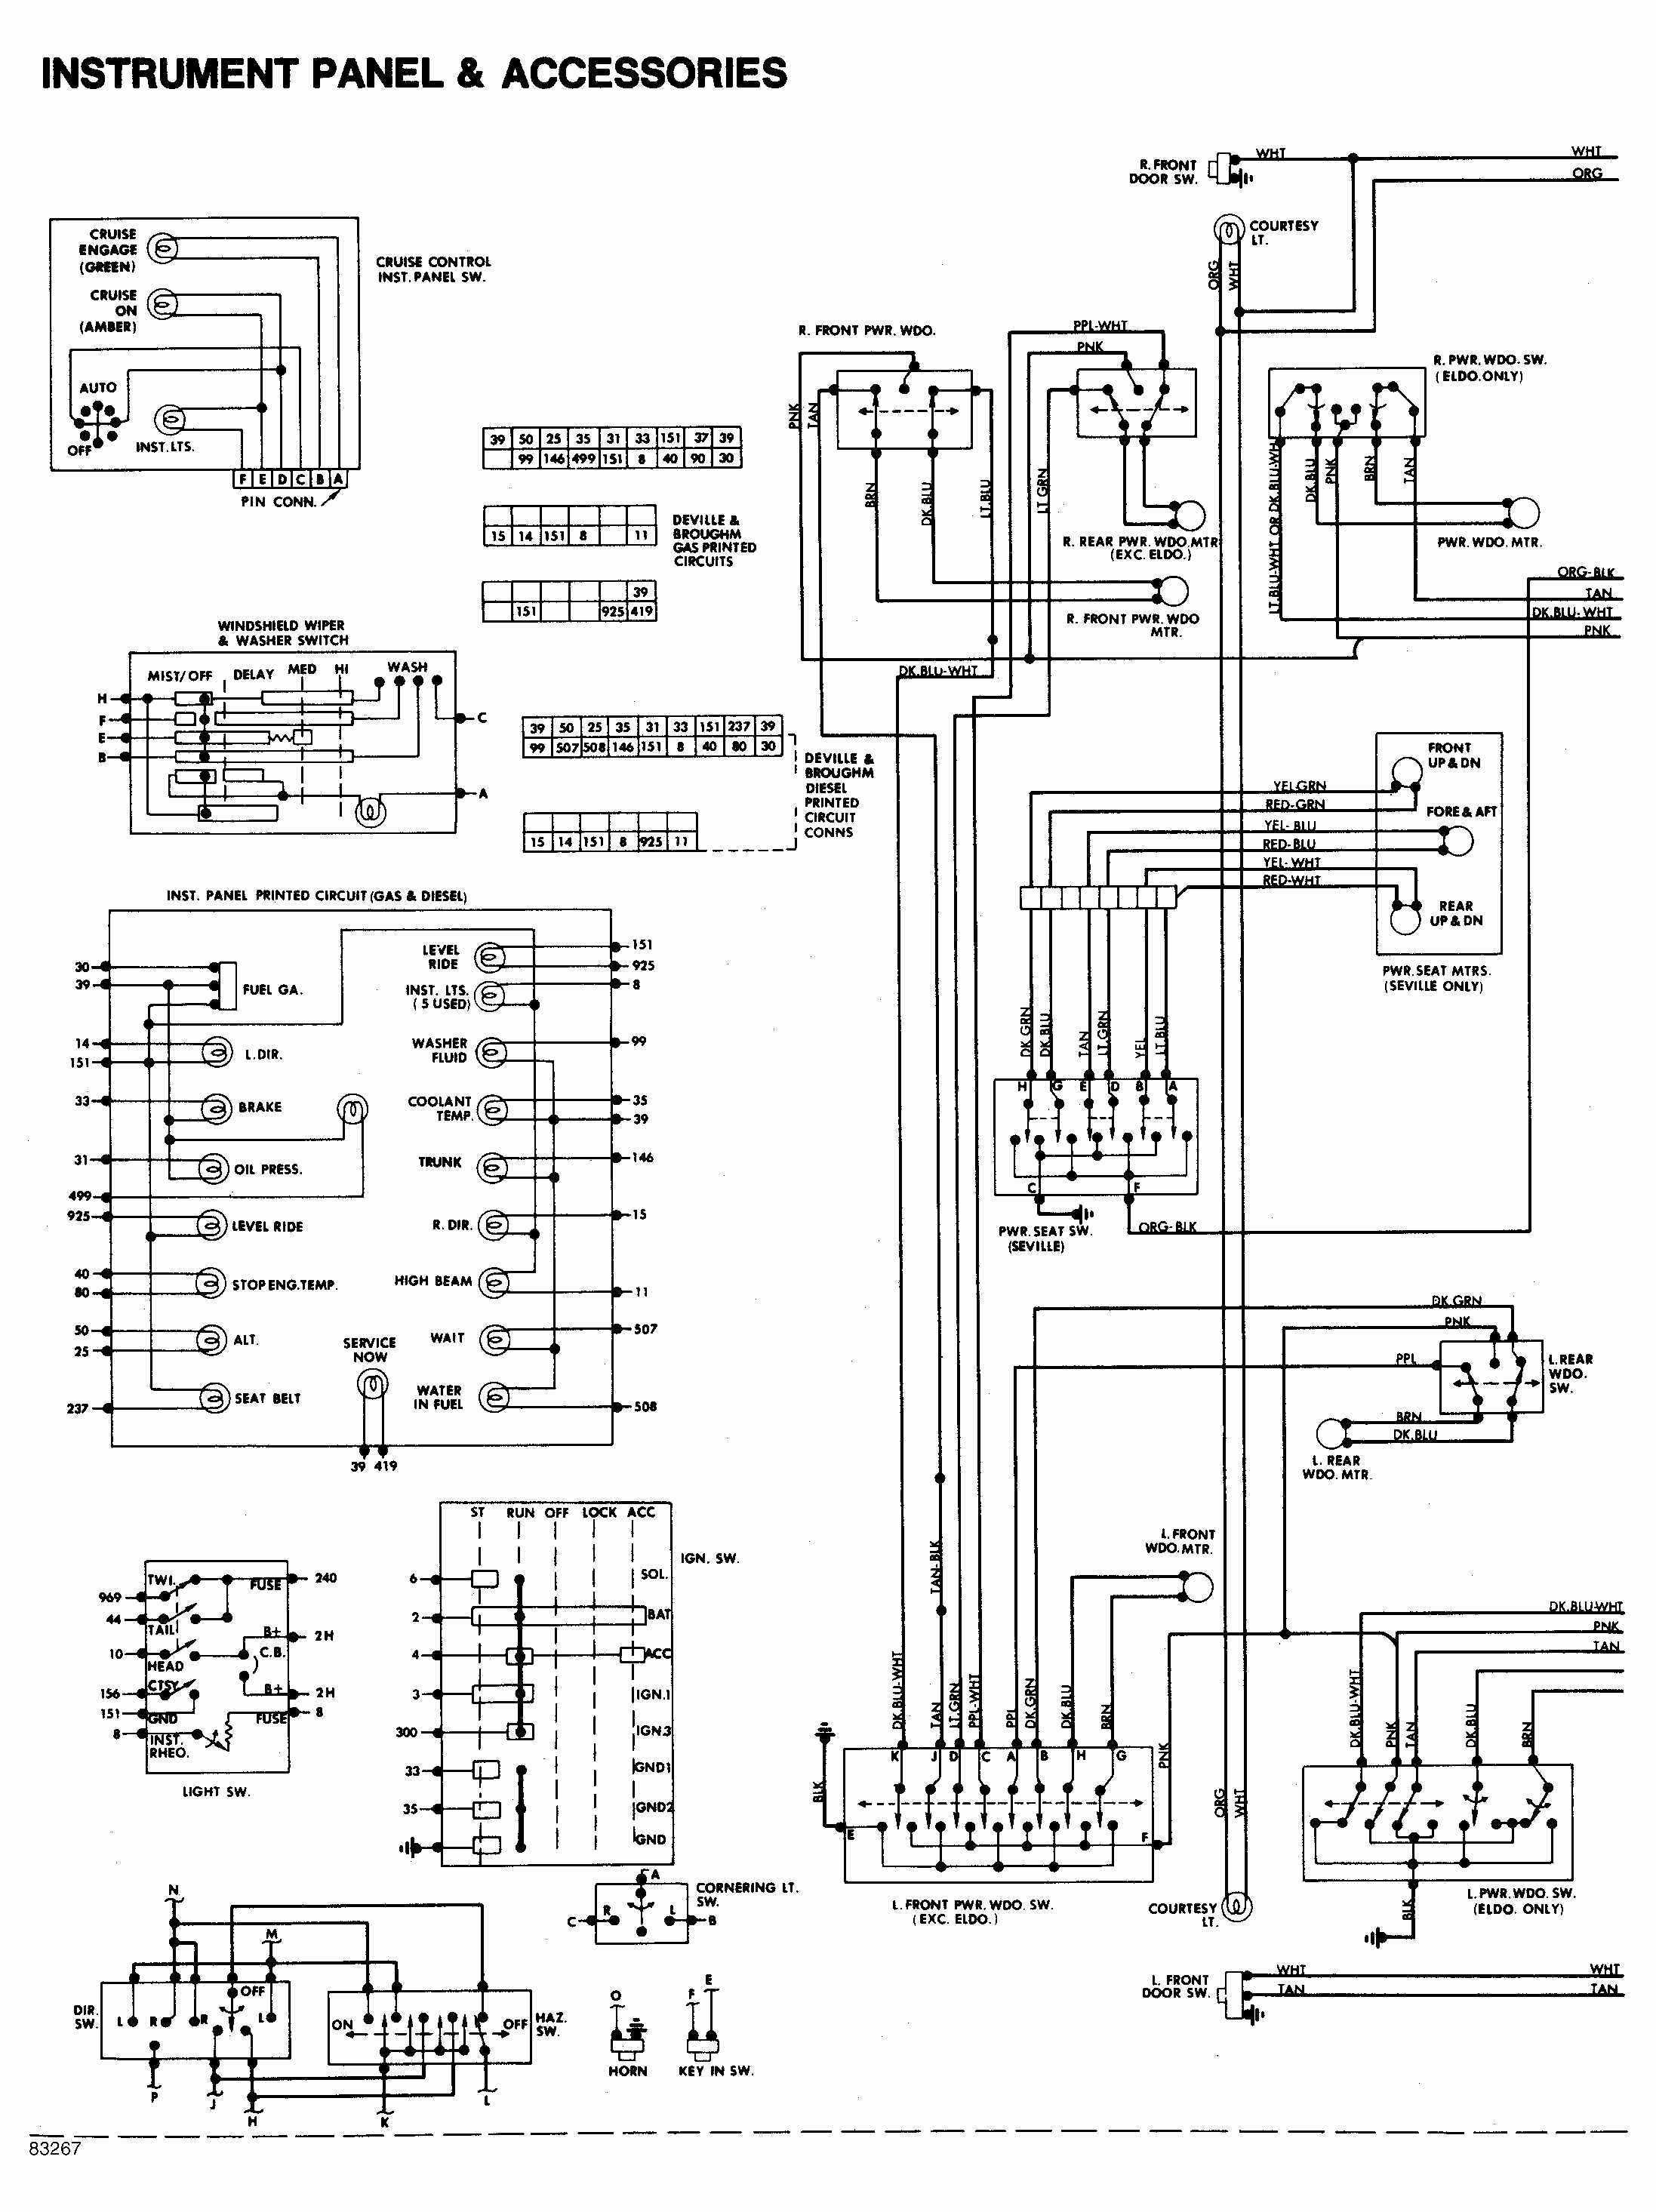 ek_7337] 1994 cadillac radio wiring wiring diagram  dome ilari ivoro bepta mohammedshrine librar wiring 101